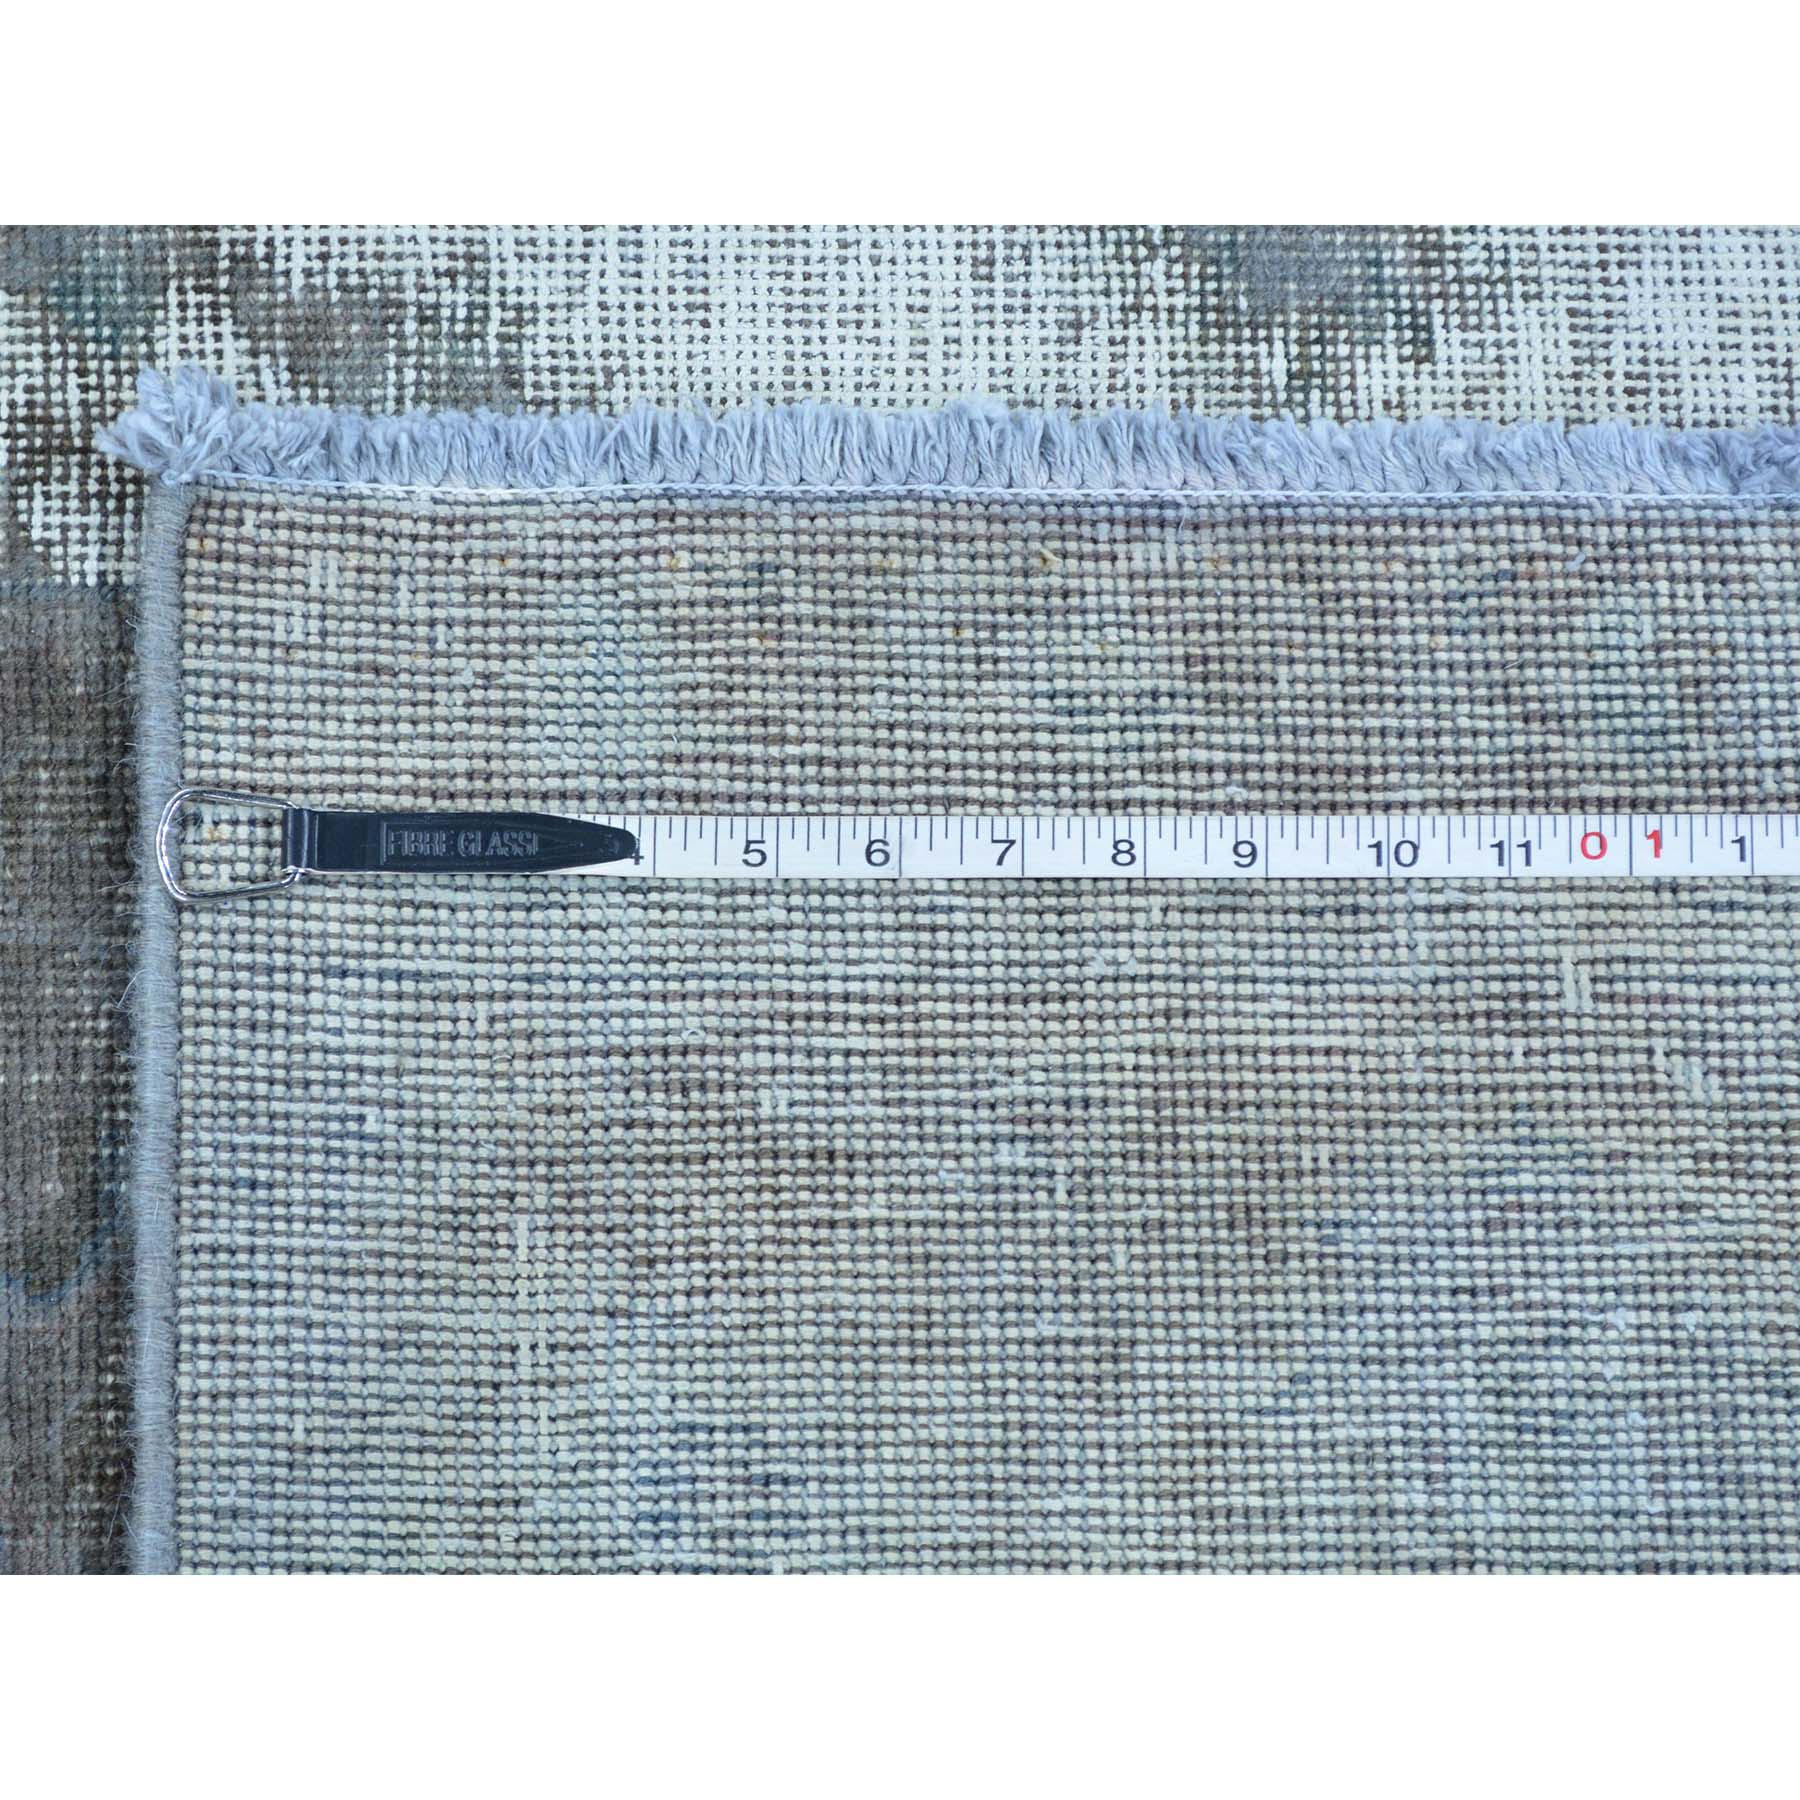 8-x11- Silver Overdyed Persian Tabriz Barjasta Pure Wool Vintage Rug